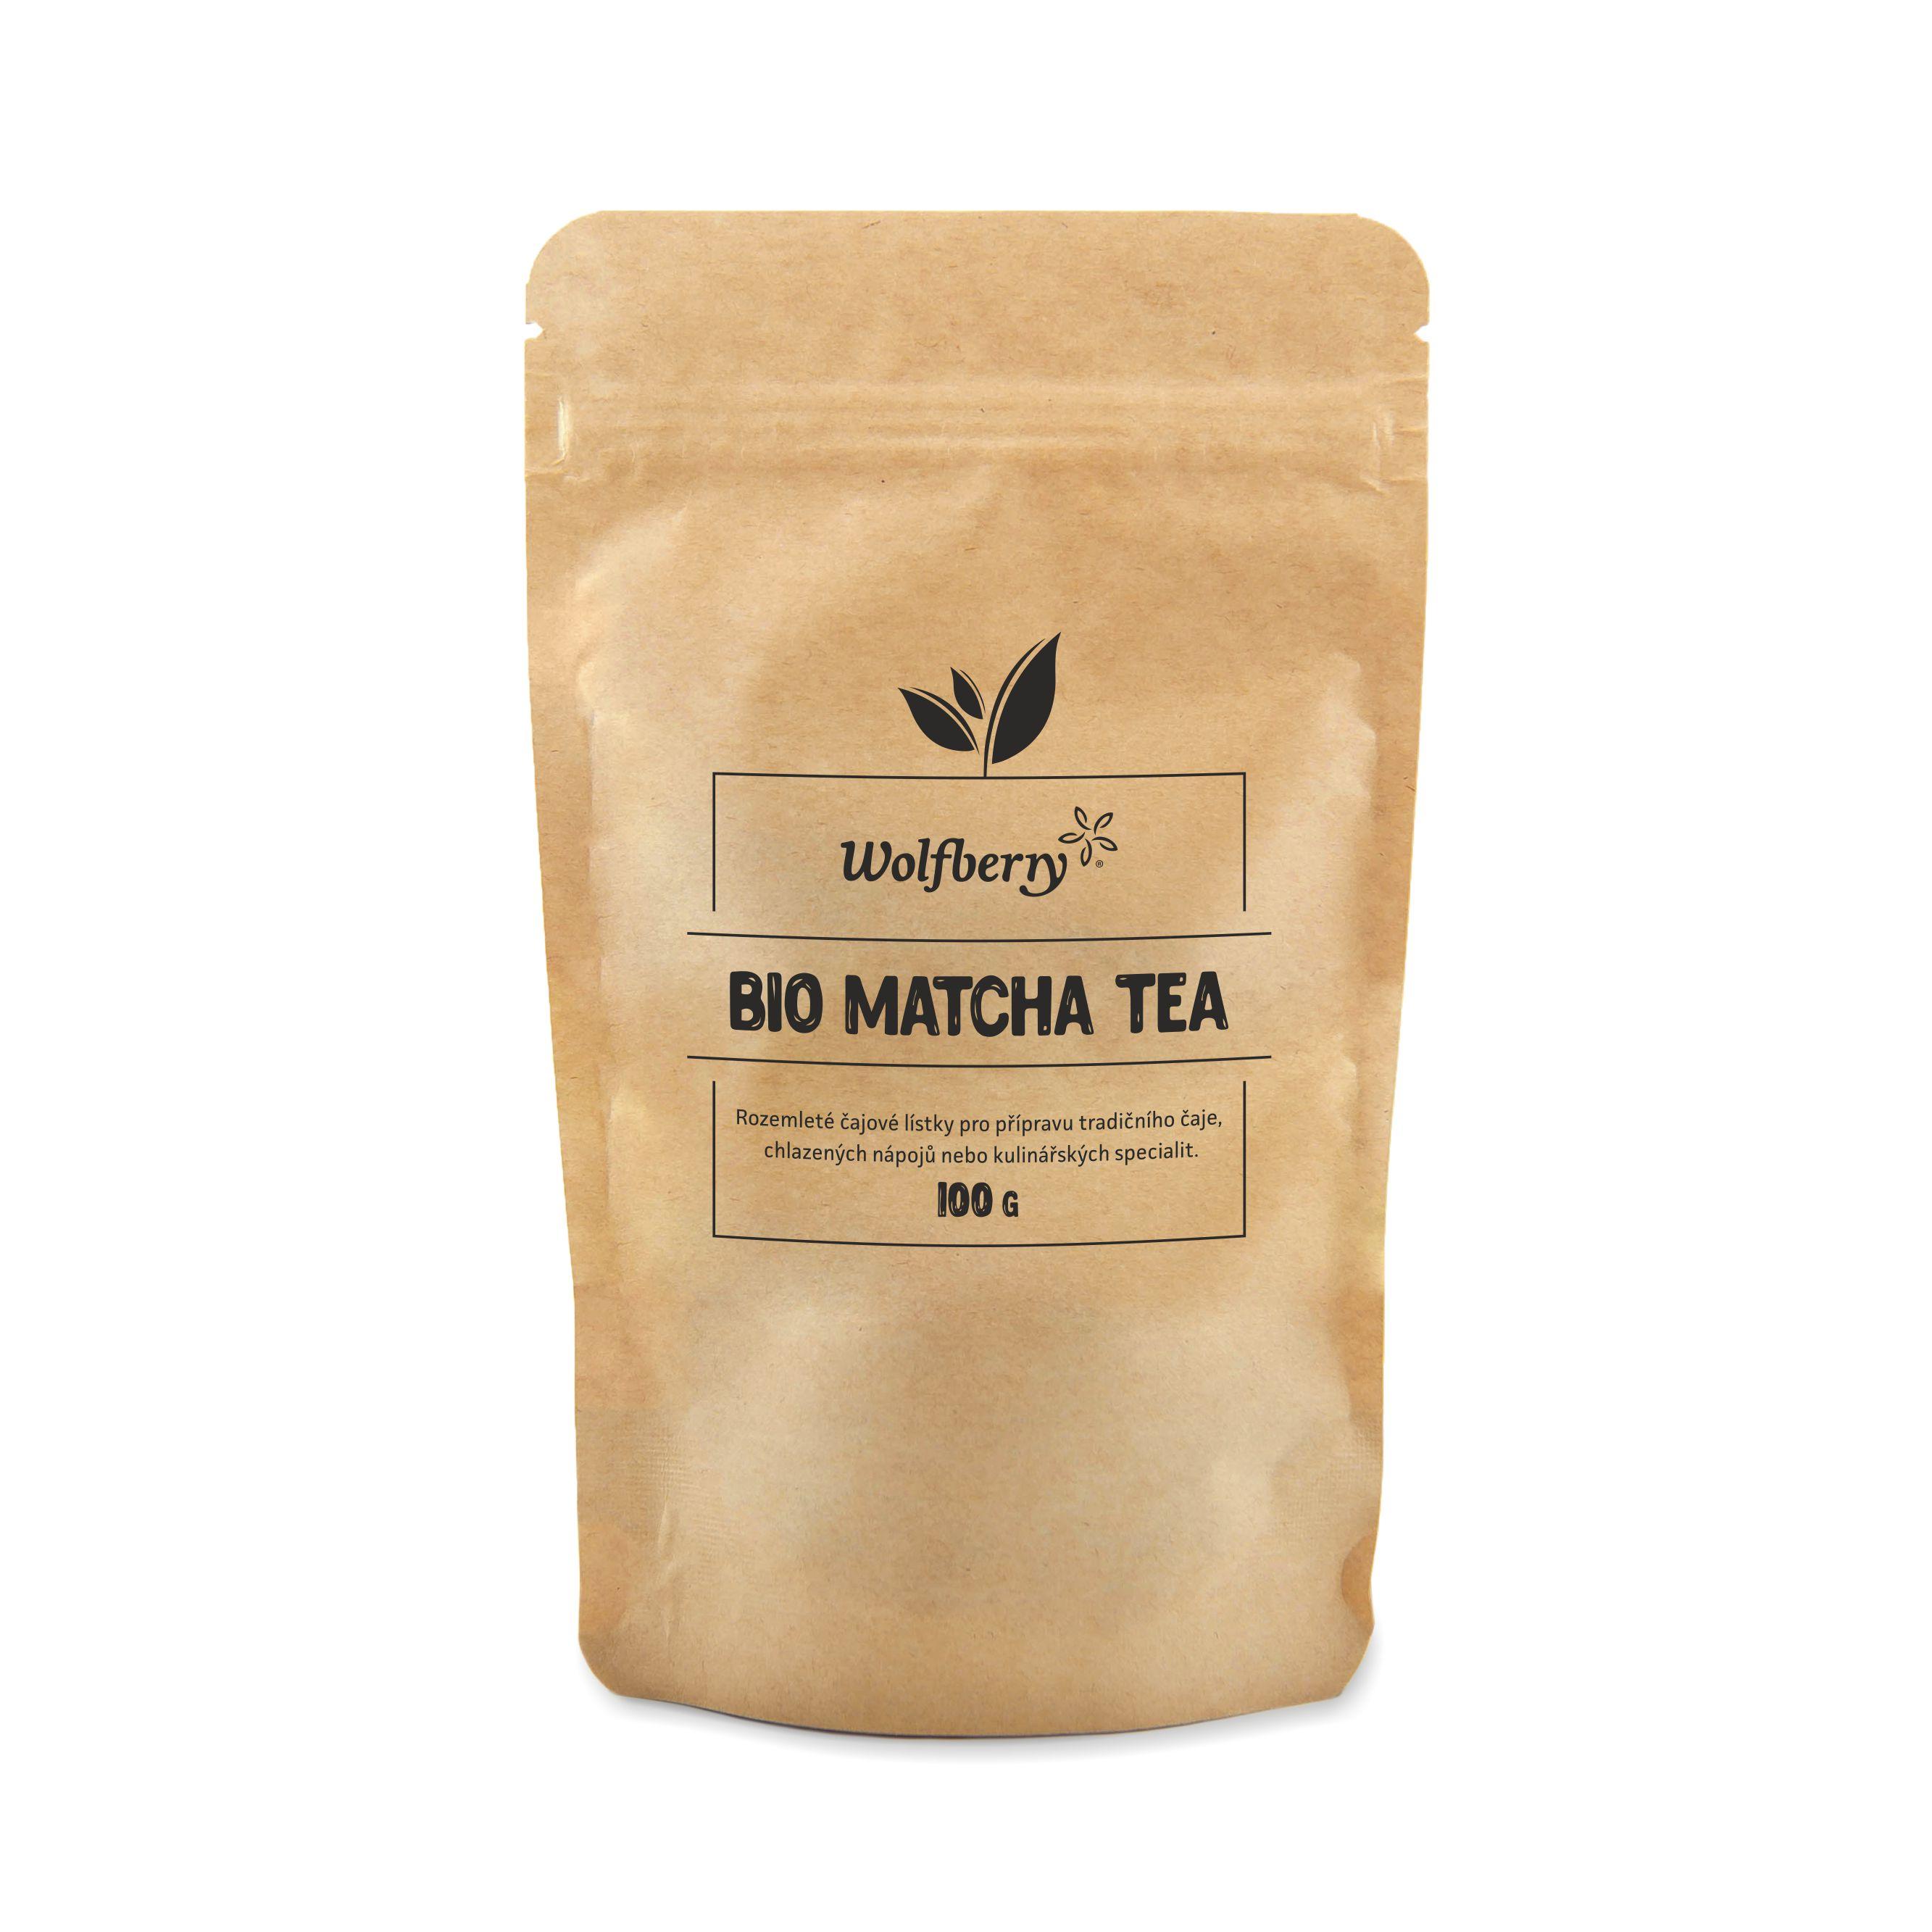 Wolfberry Matcha tea BIO 100 g Wolfberry * 100g